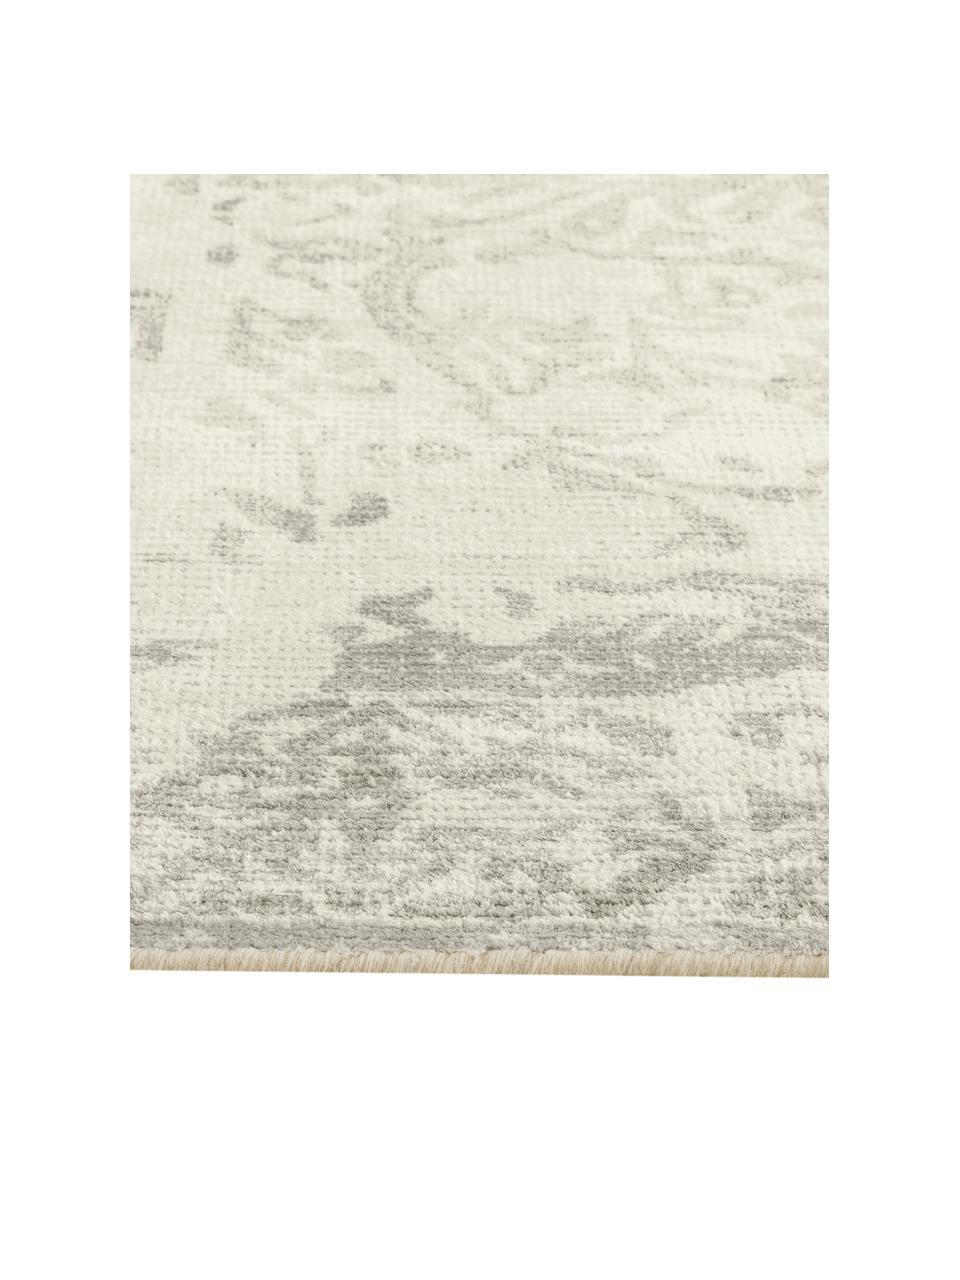 Tapis vintage beige Florentine, Beige, gris clair